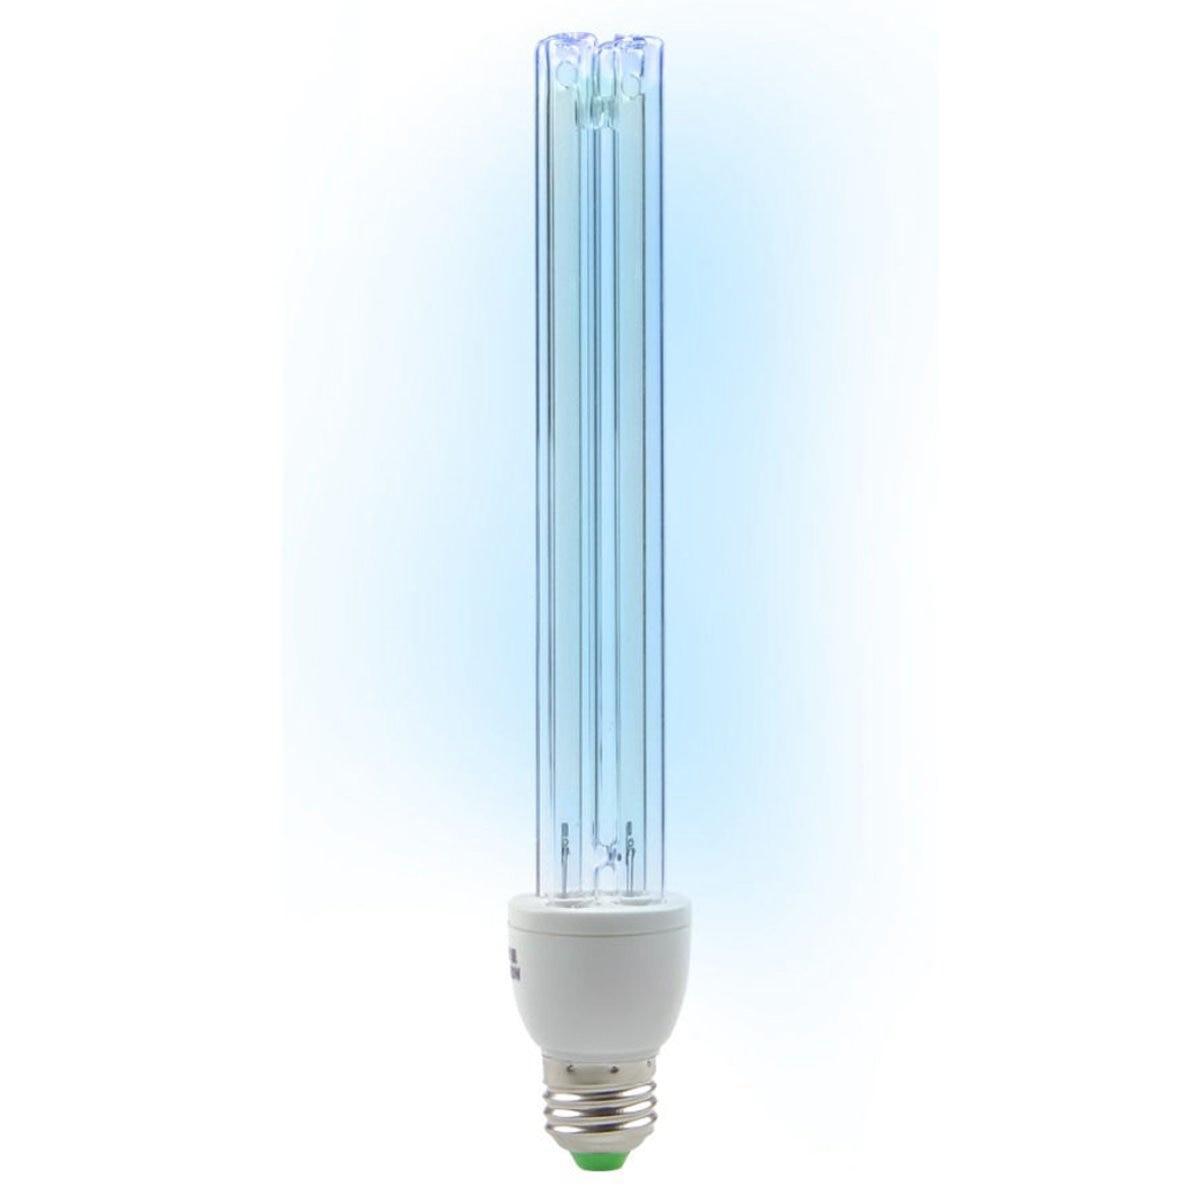 Ultravioleta luz UV lámpara bombilla tubo E27 20 W AC220V UVC desinfección ozono esterilización ácaros luces lámpara germicida bombilla